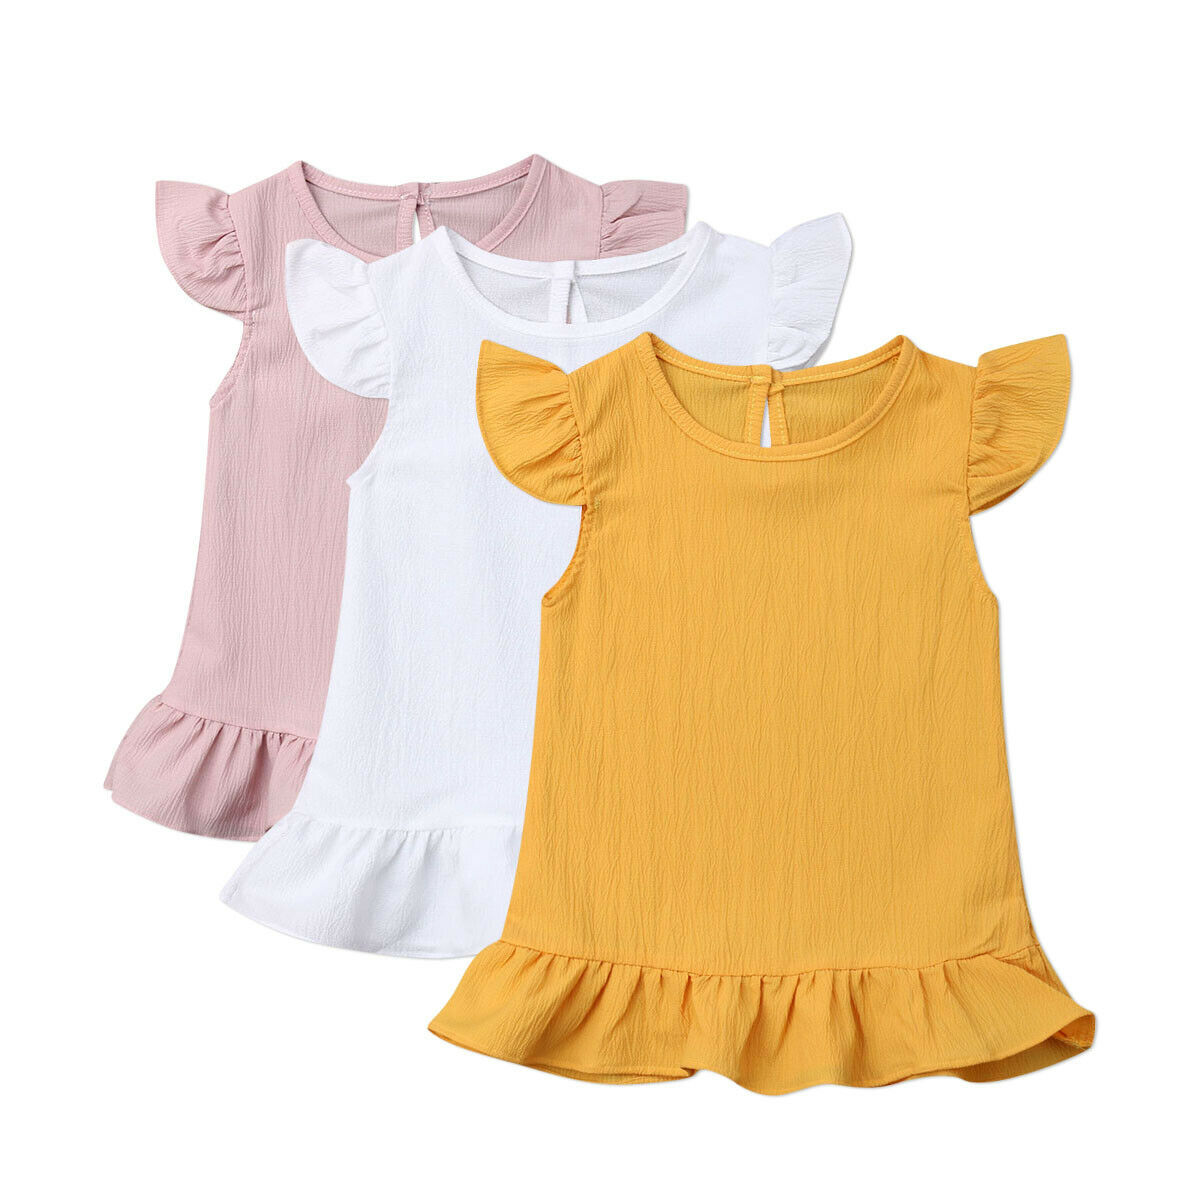 Cute Sleeveless Kids Girls Chiffon Dress Solid Summer Flying Sleeve Party Dress Sundress Clothes